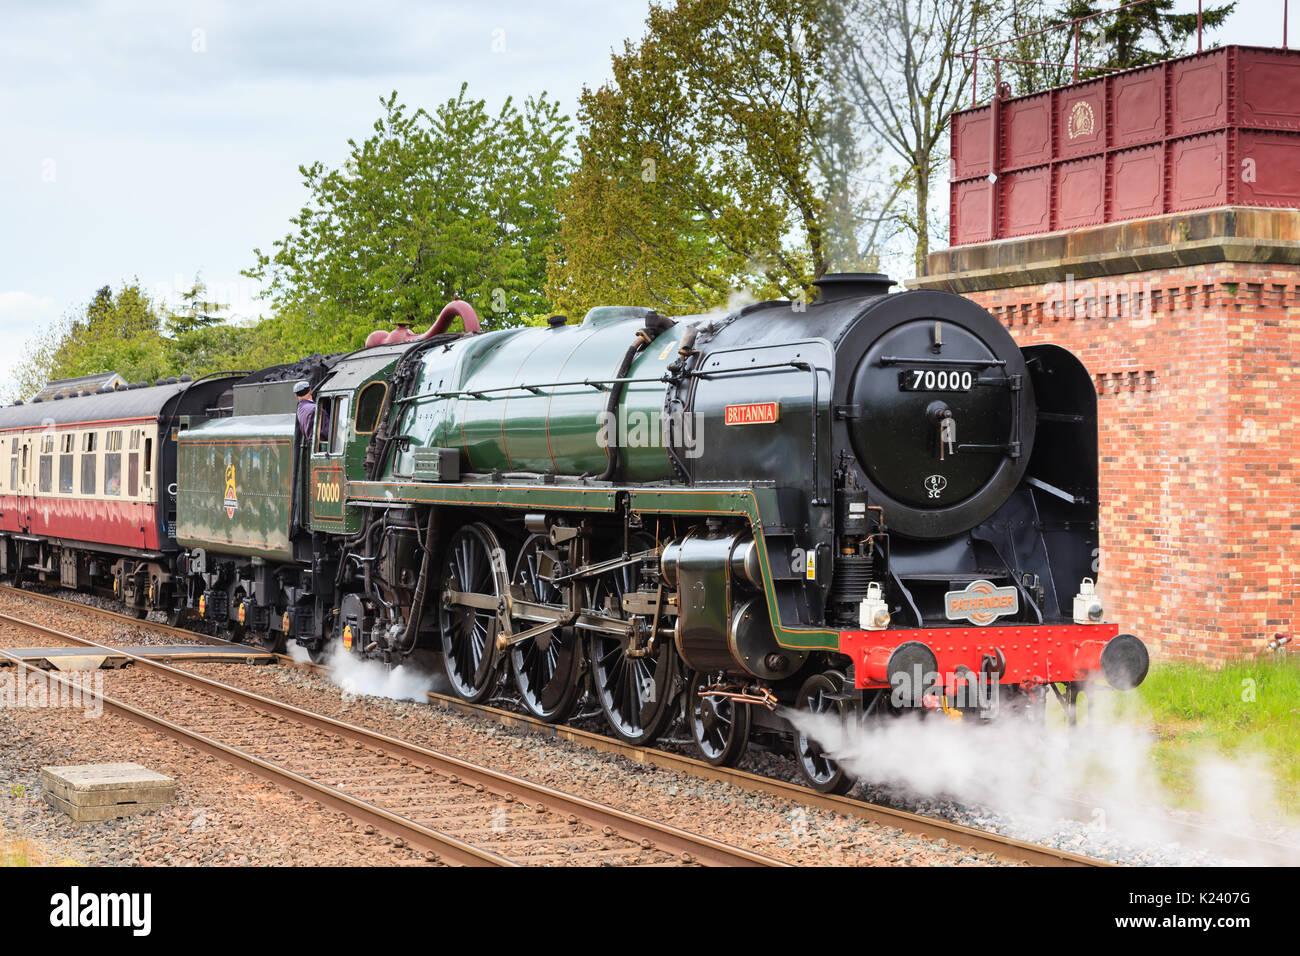 Steam locomotive 70000 Britannia heads the Cumbrian Fells